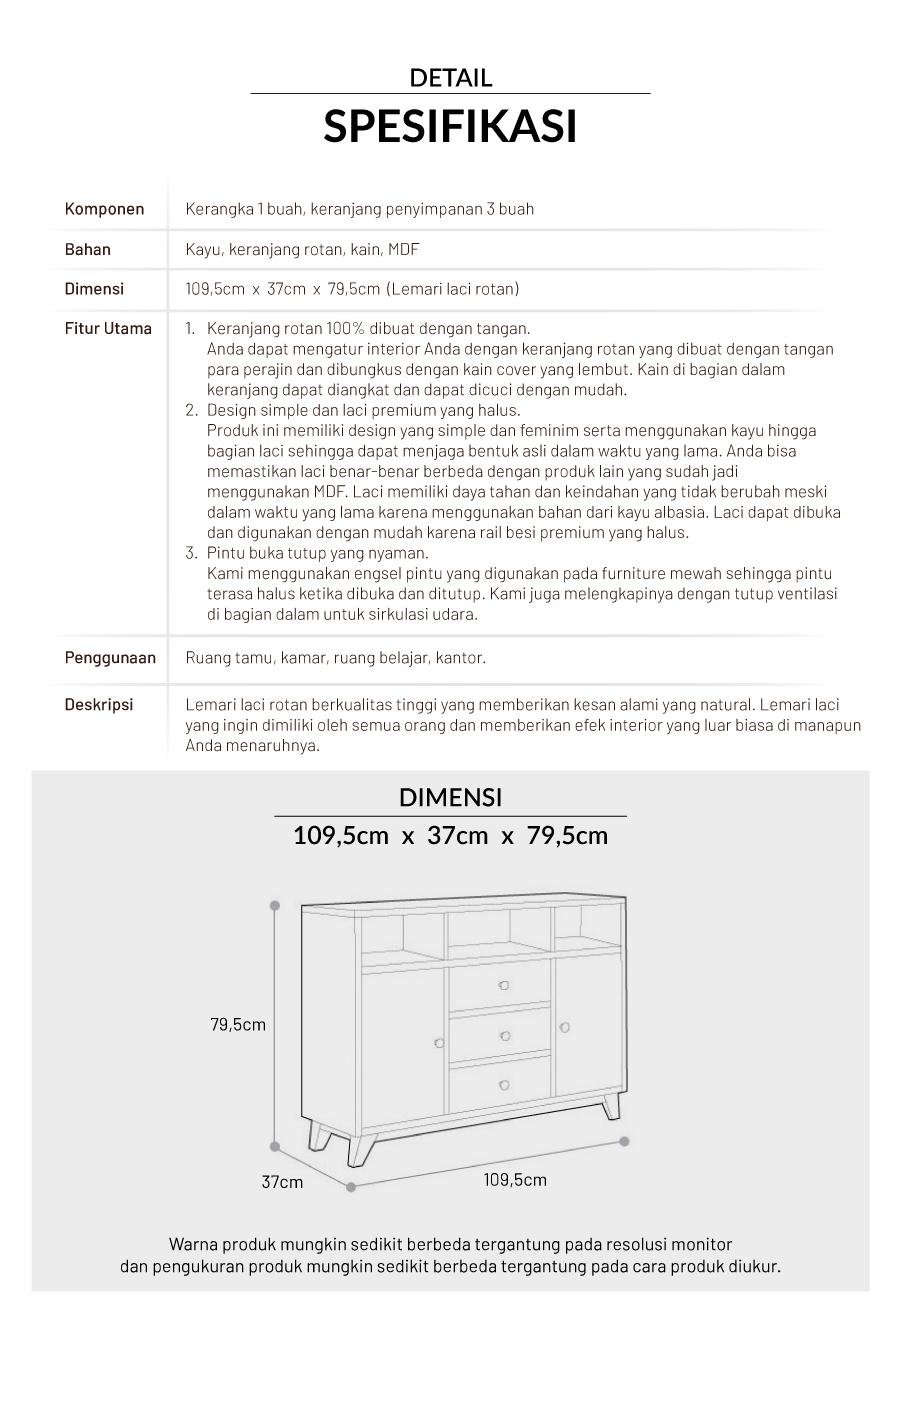 new_ivan54_information.jpg